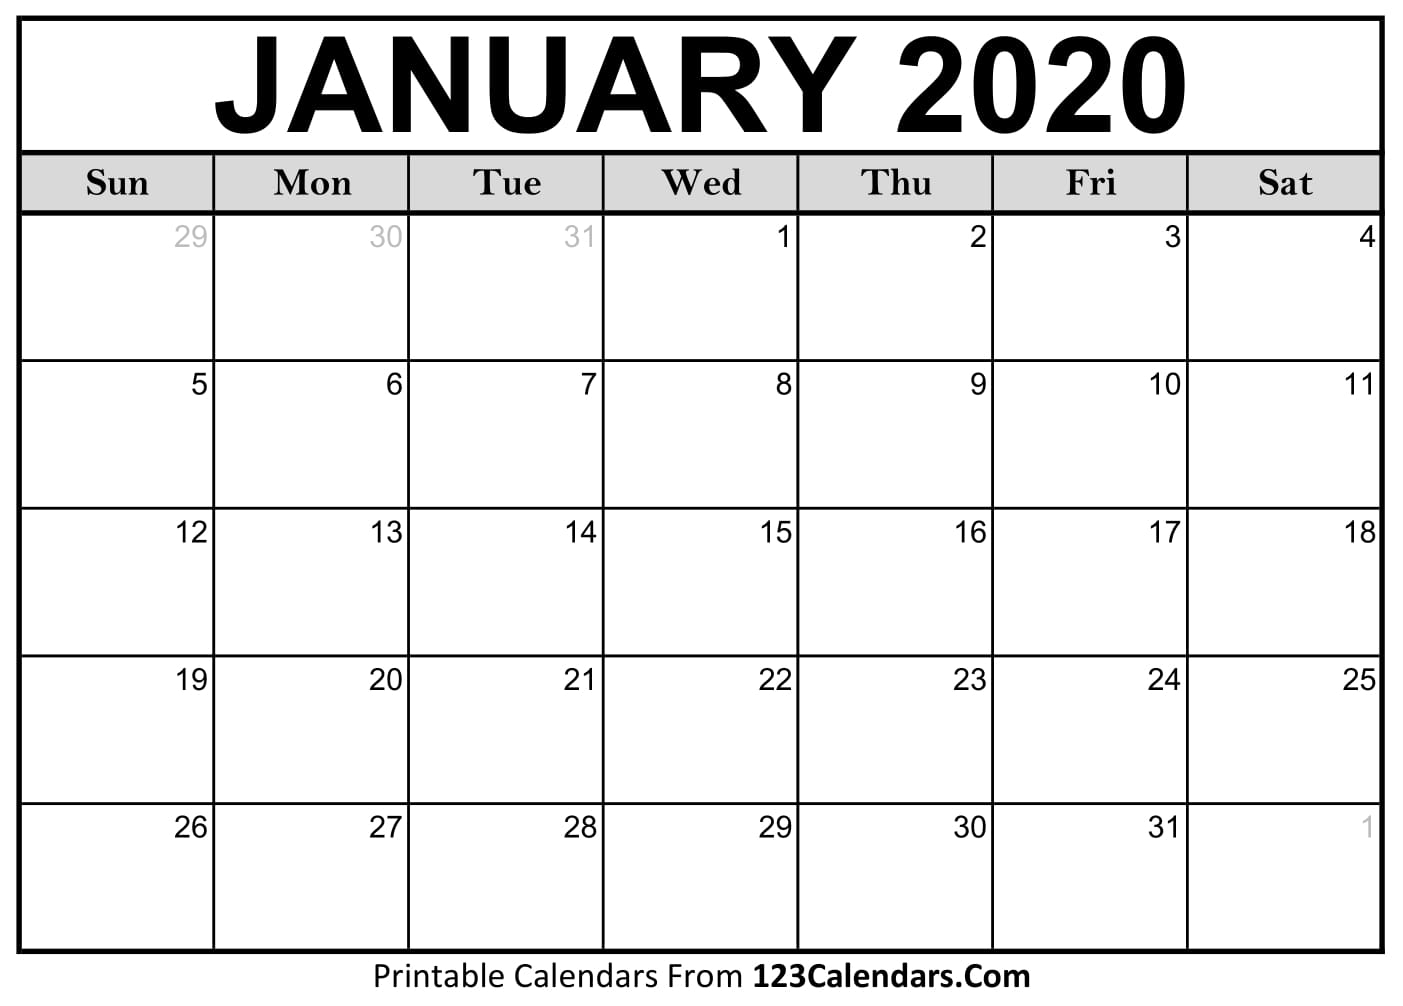 Printable Fill In Calendar For 2020  Calendar Inspiration with Fill In Calendar